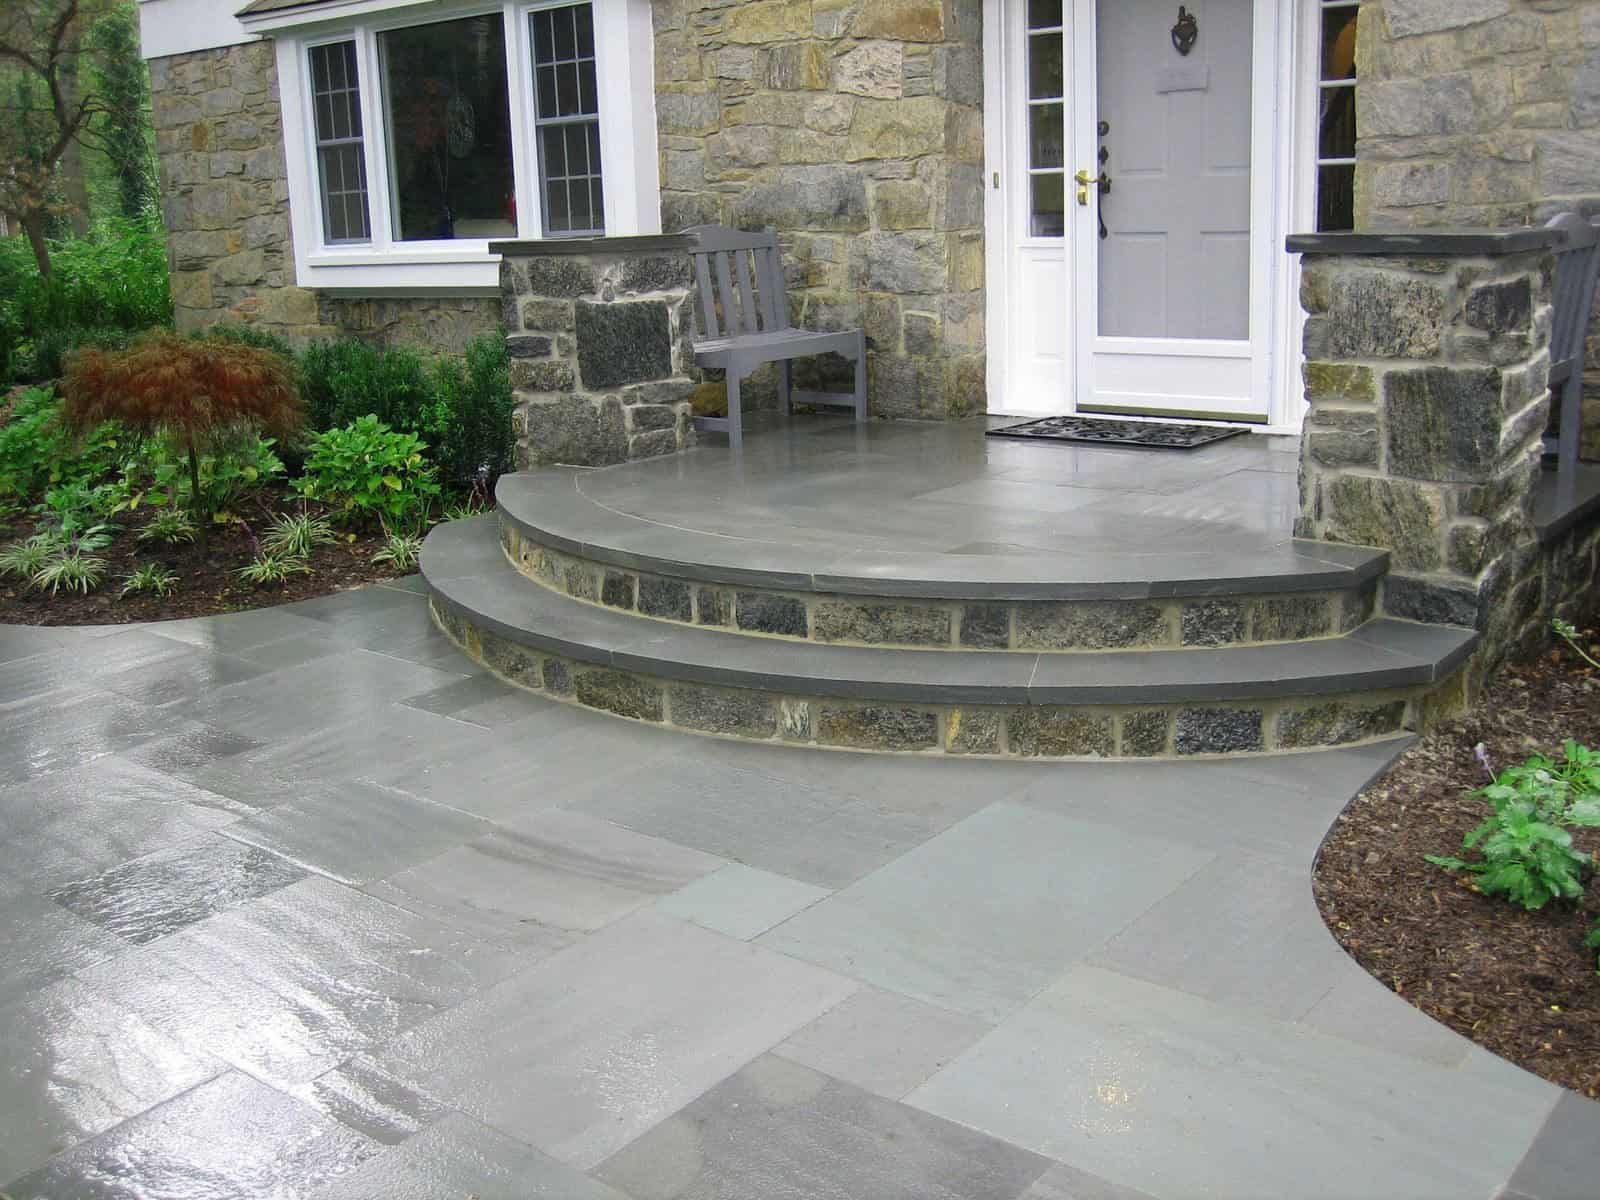 Natural Stone Walkway - 1 inch Thermal Bluestone Walkway and Stoop - Random Pattern - Merrick, Long Island NY